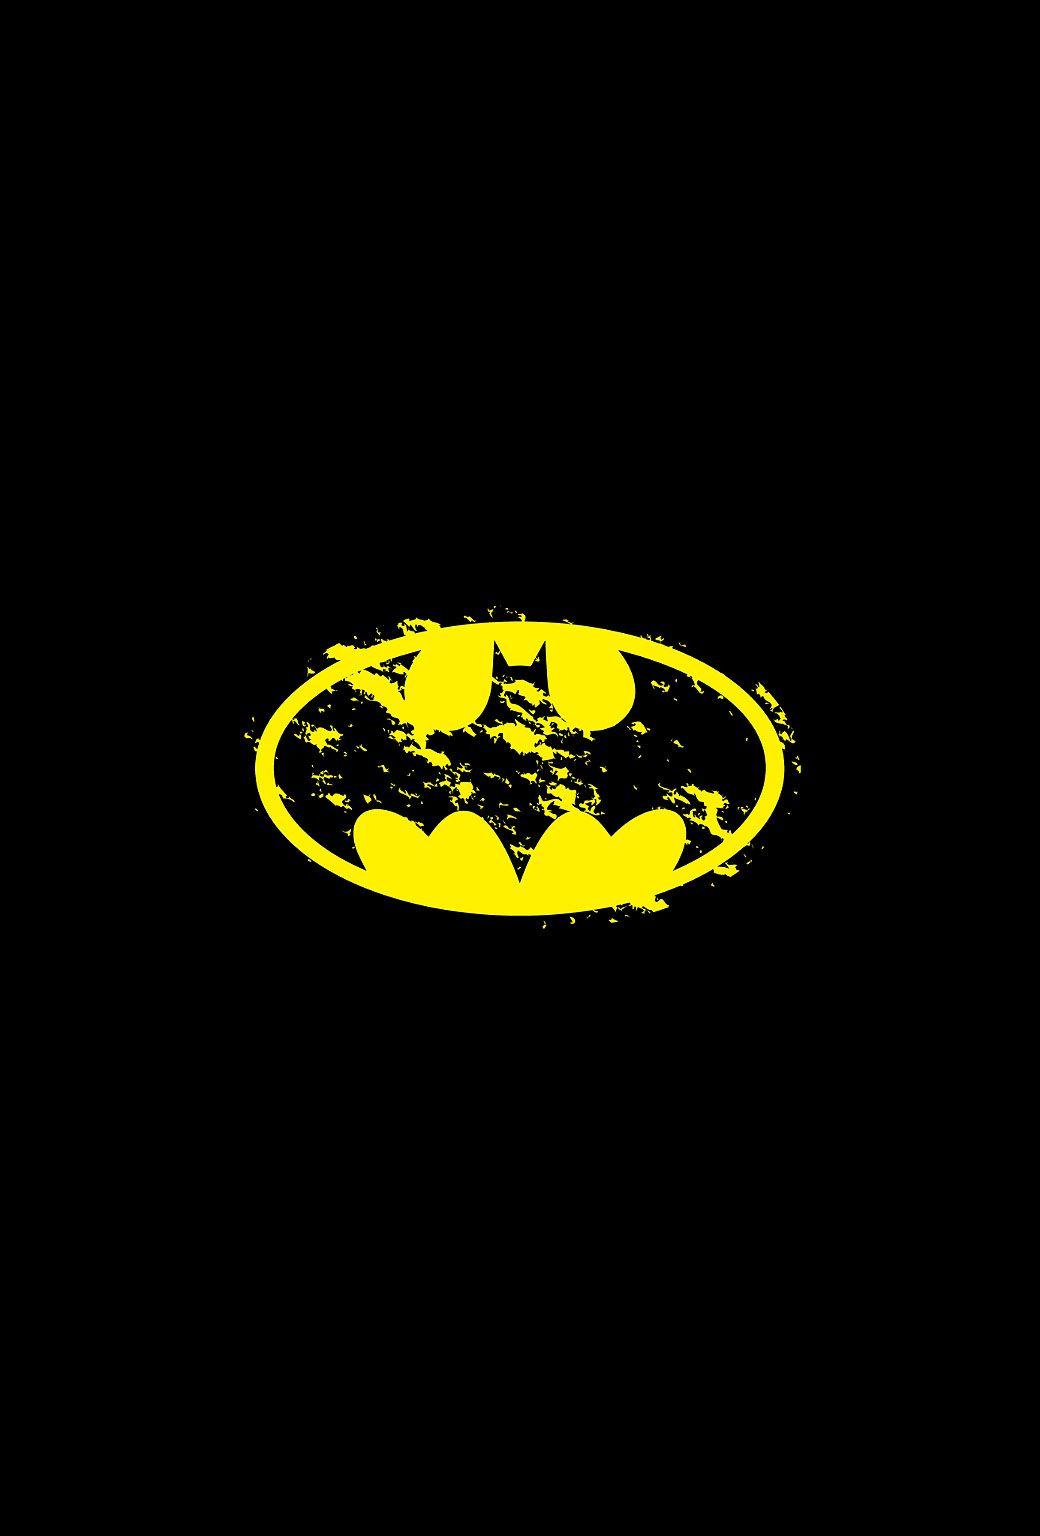 Superhero Logo iPhone Wallpapers.